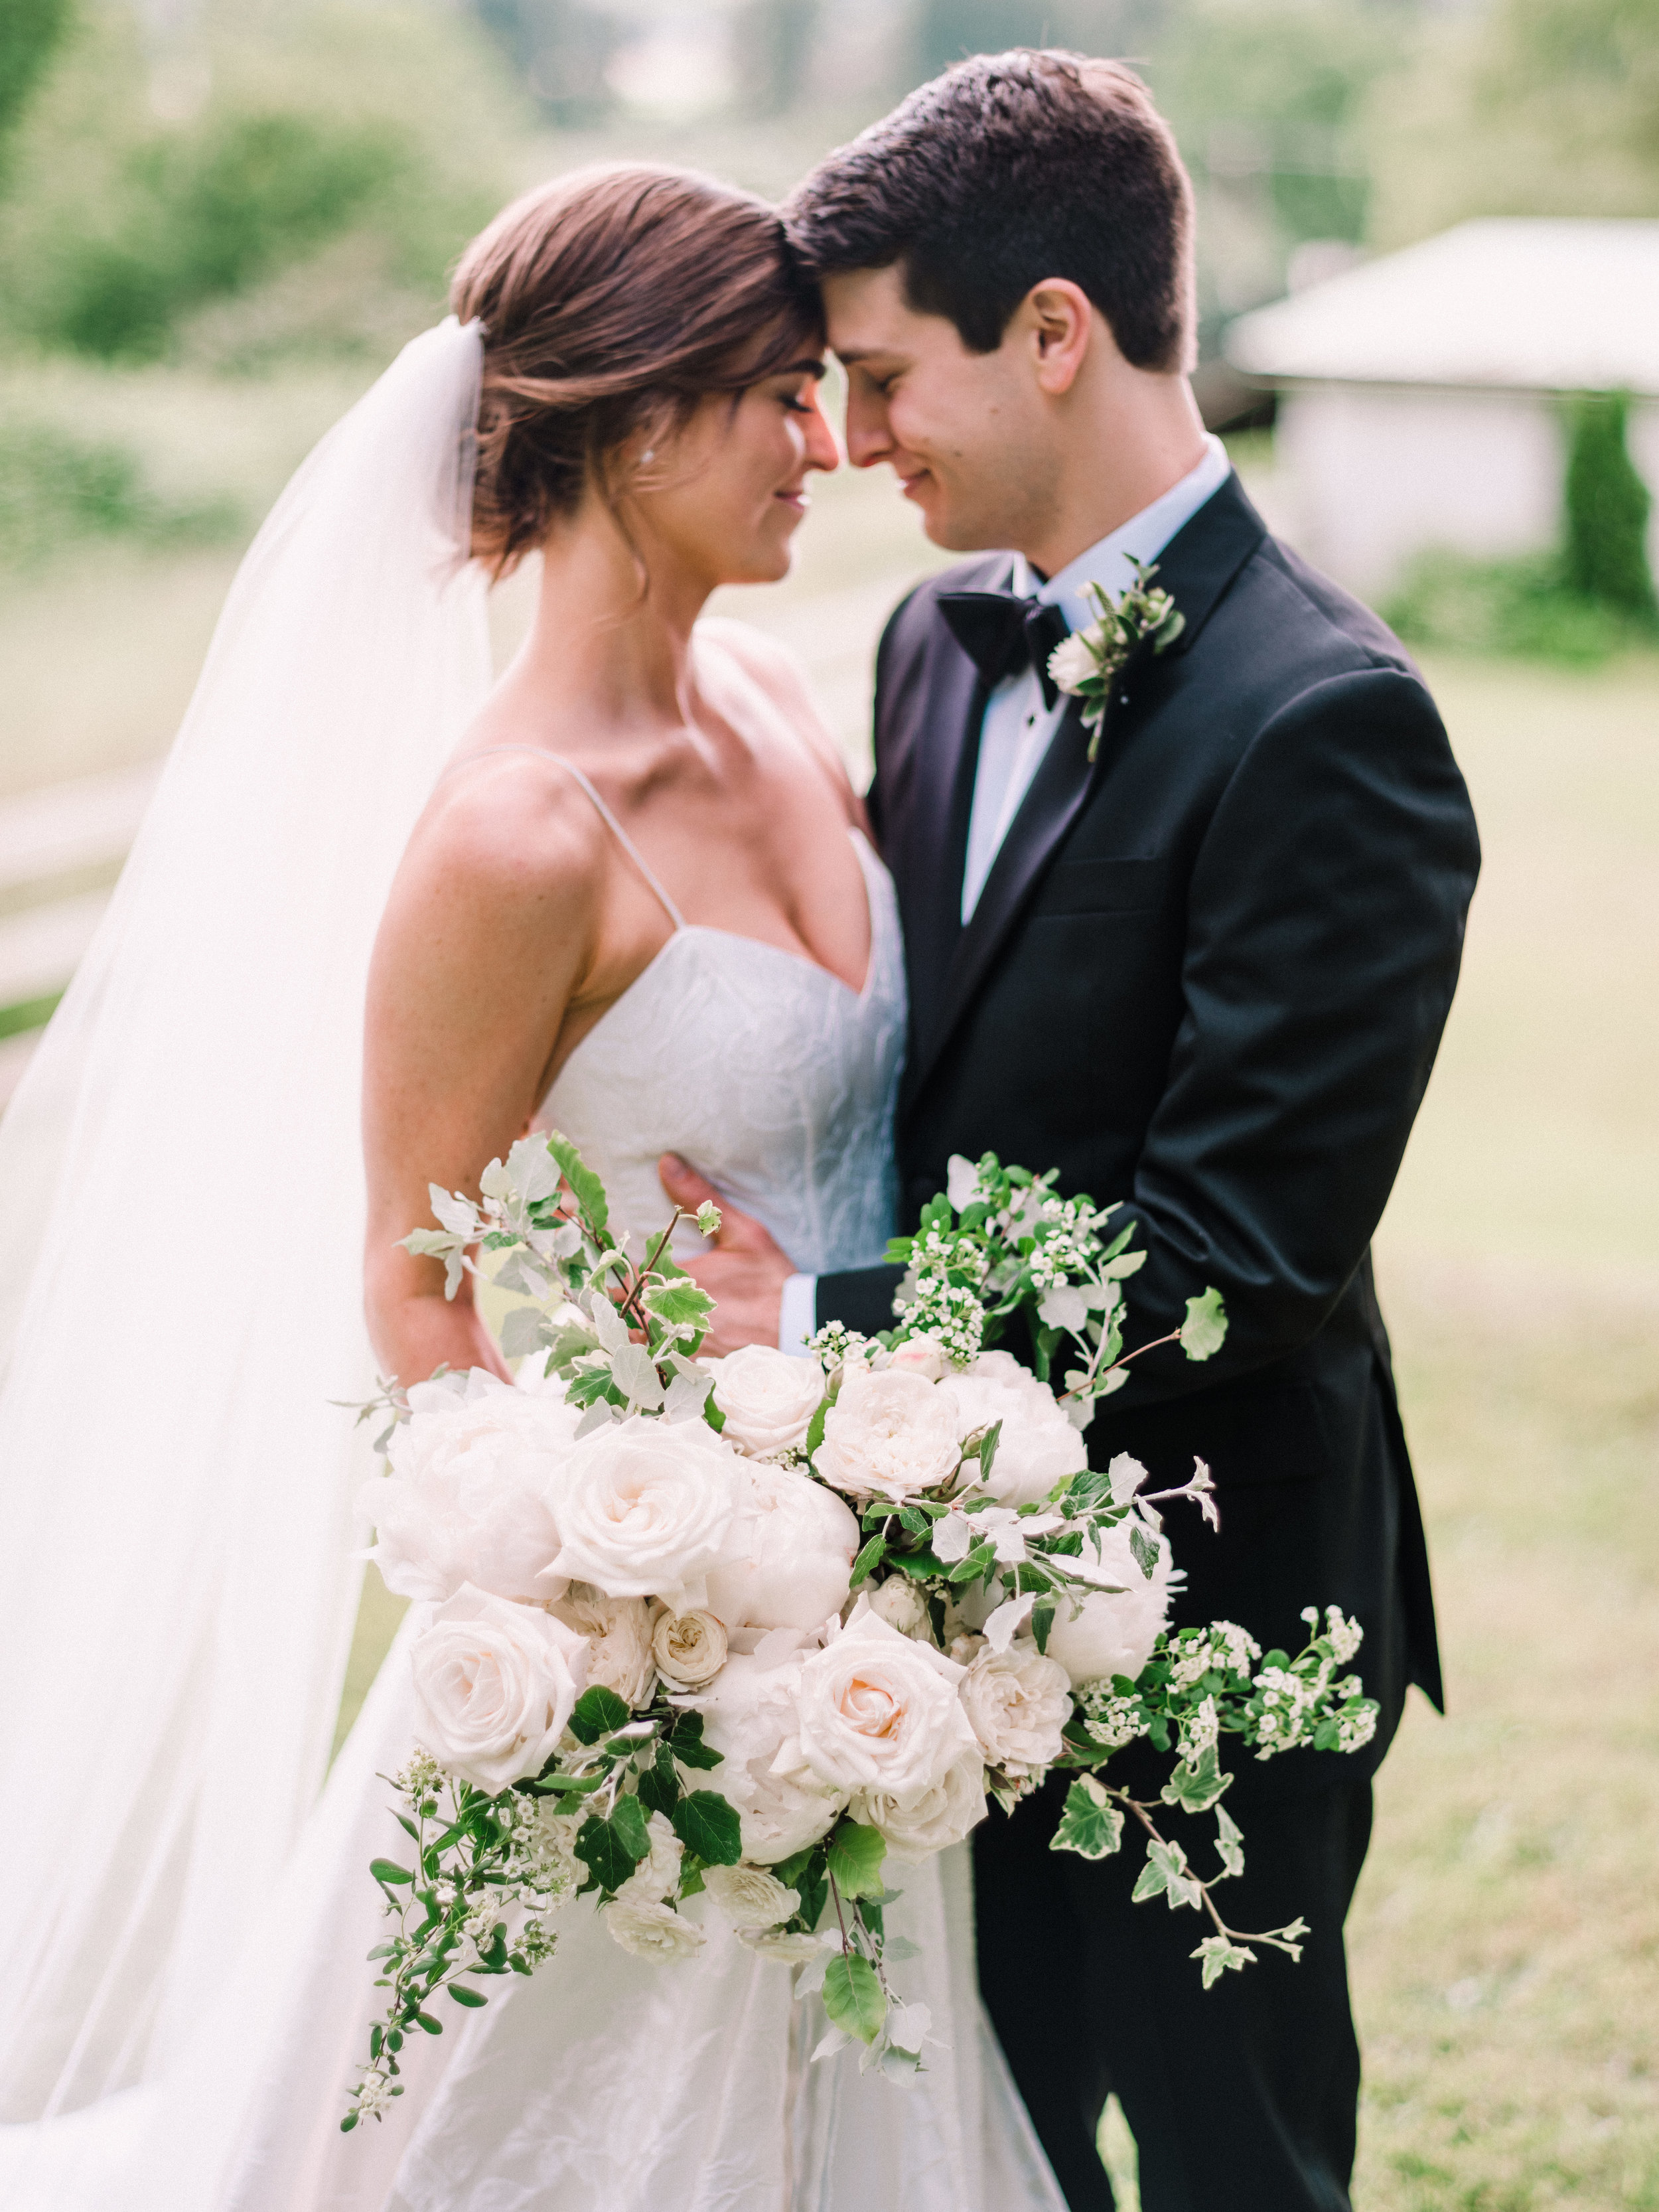 paige-peter-wedding-237.jpg